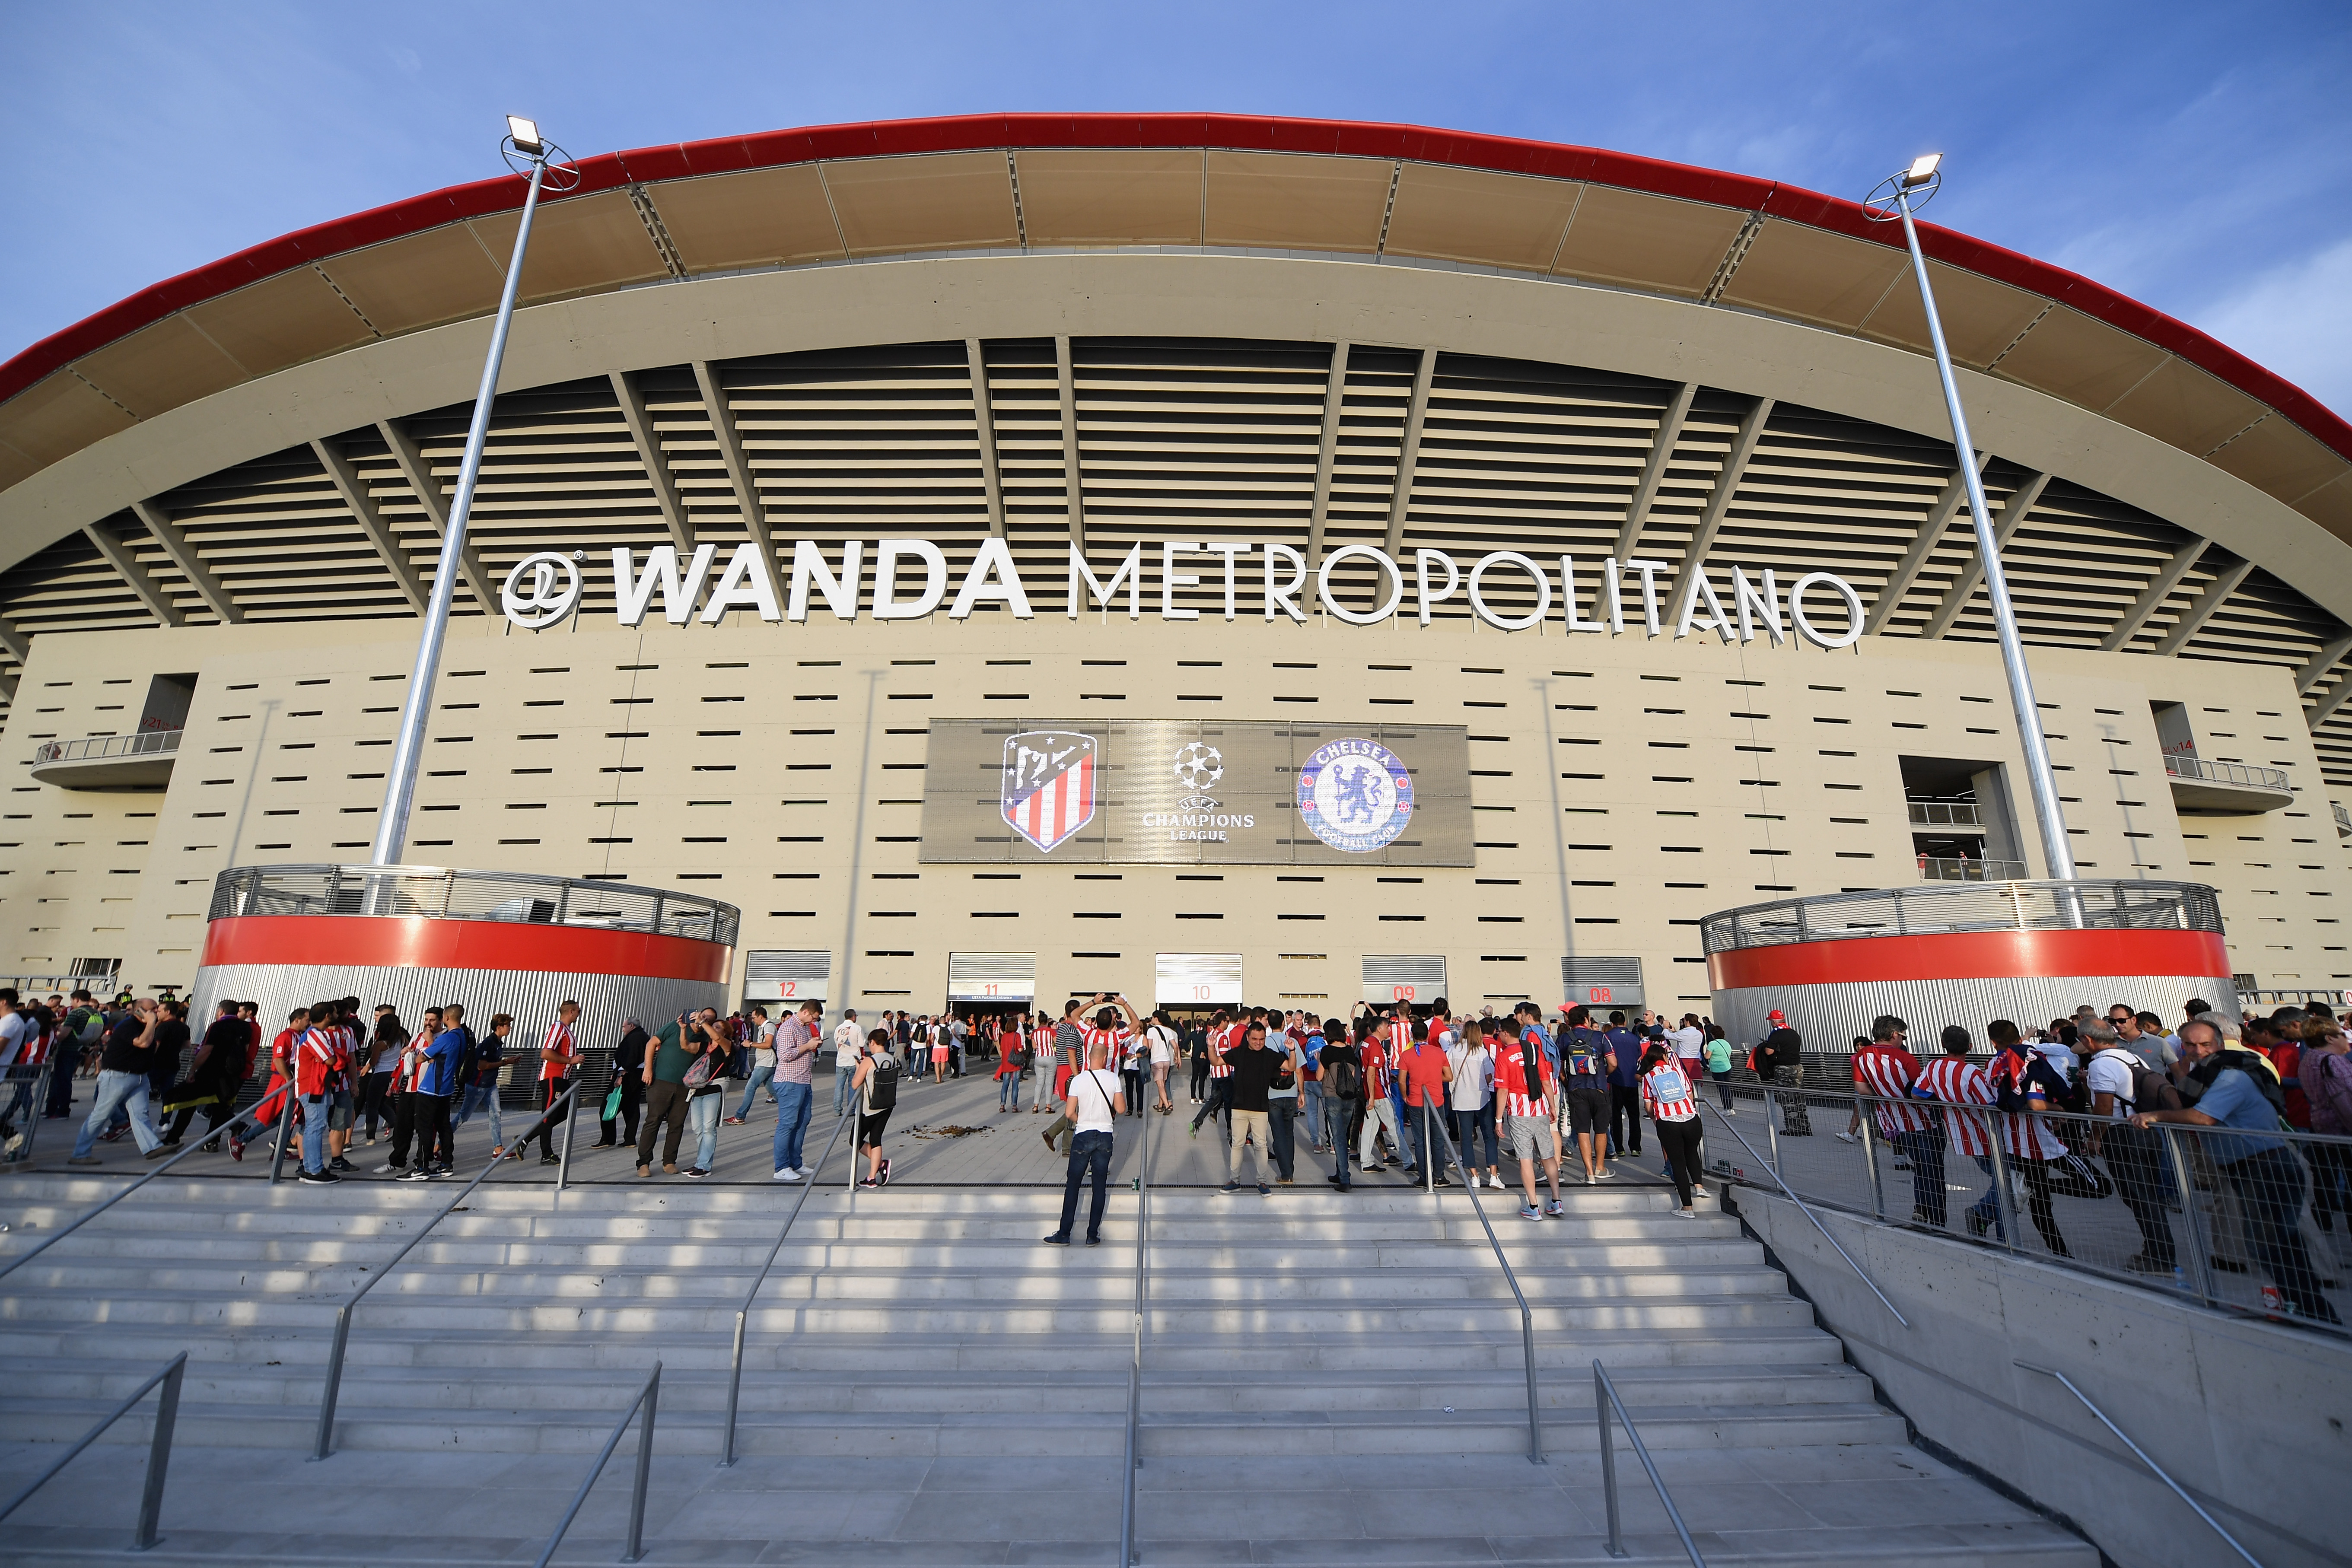 So You Want to Watch Liverpool vs. Tottenham Live at Madrid's Wanda Metropolitano...